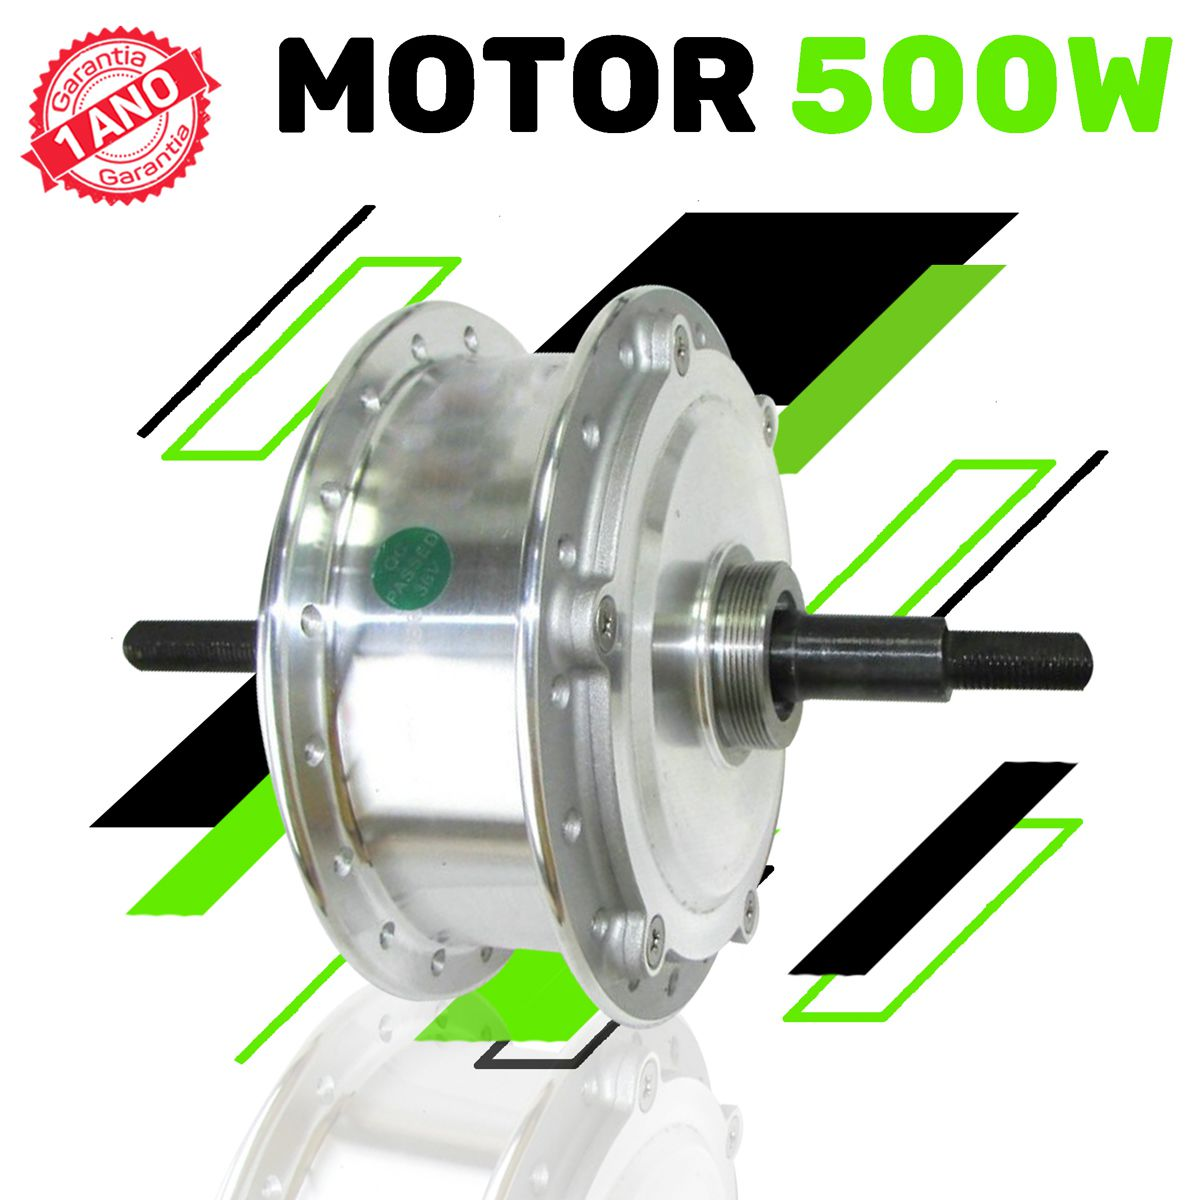 Bicicleta Elétrica Aro 26 Alumínio Bateria de Litio TecUltra - 500W